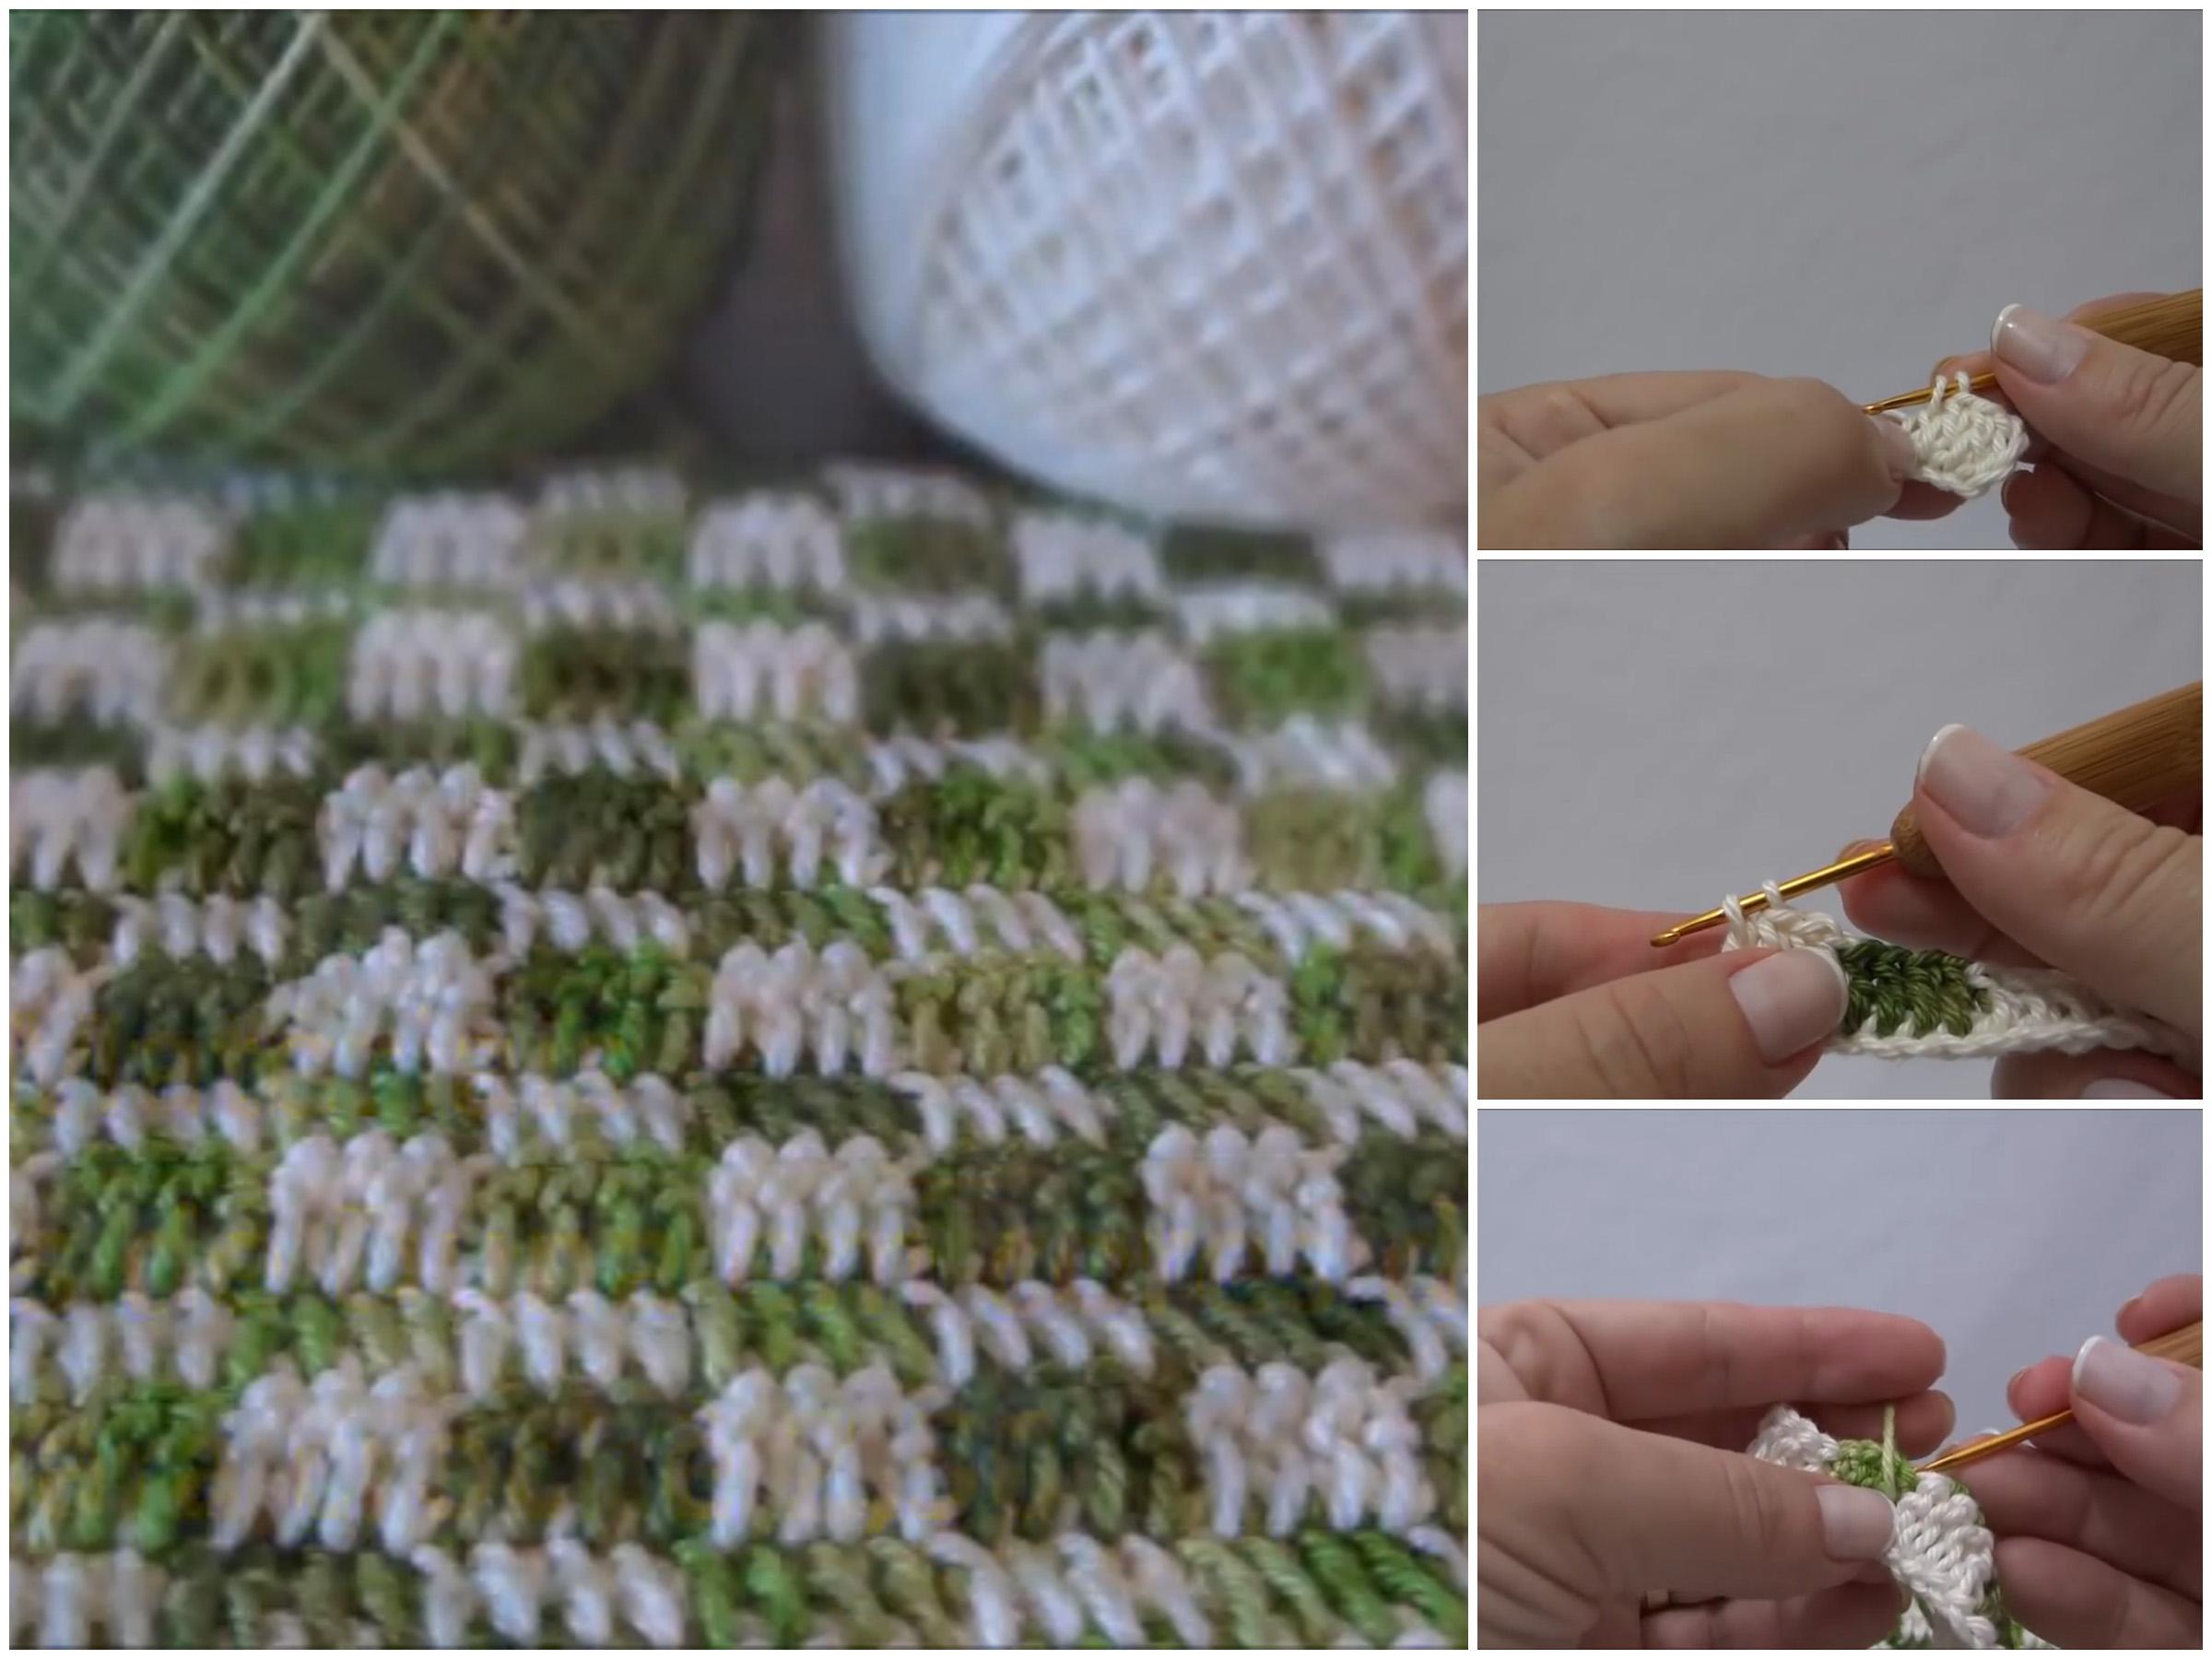 Point Crochet Squares